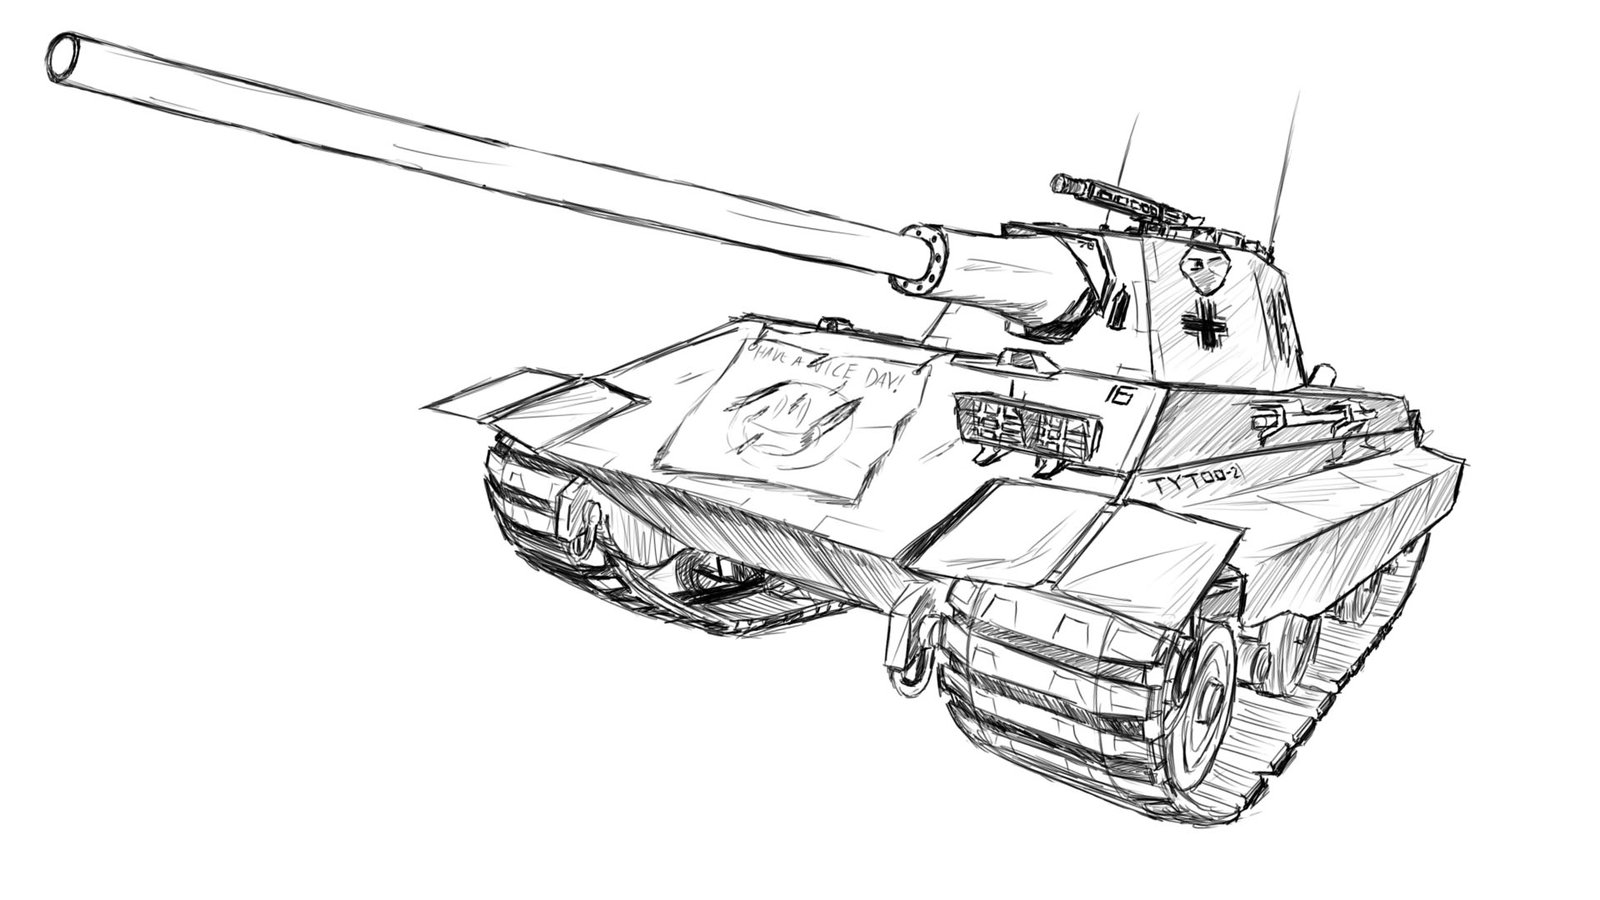 1600x900 Panzerkampfwagen E50 Ausf. M Sketch Drawing By Medessec